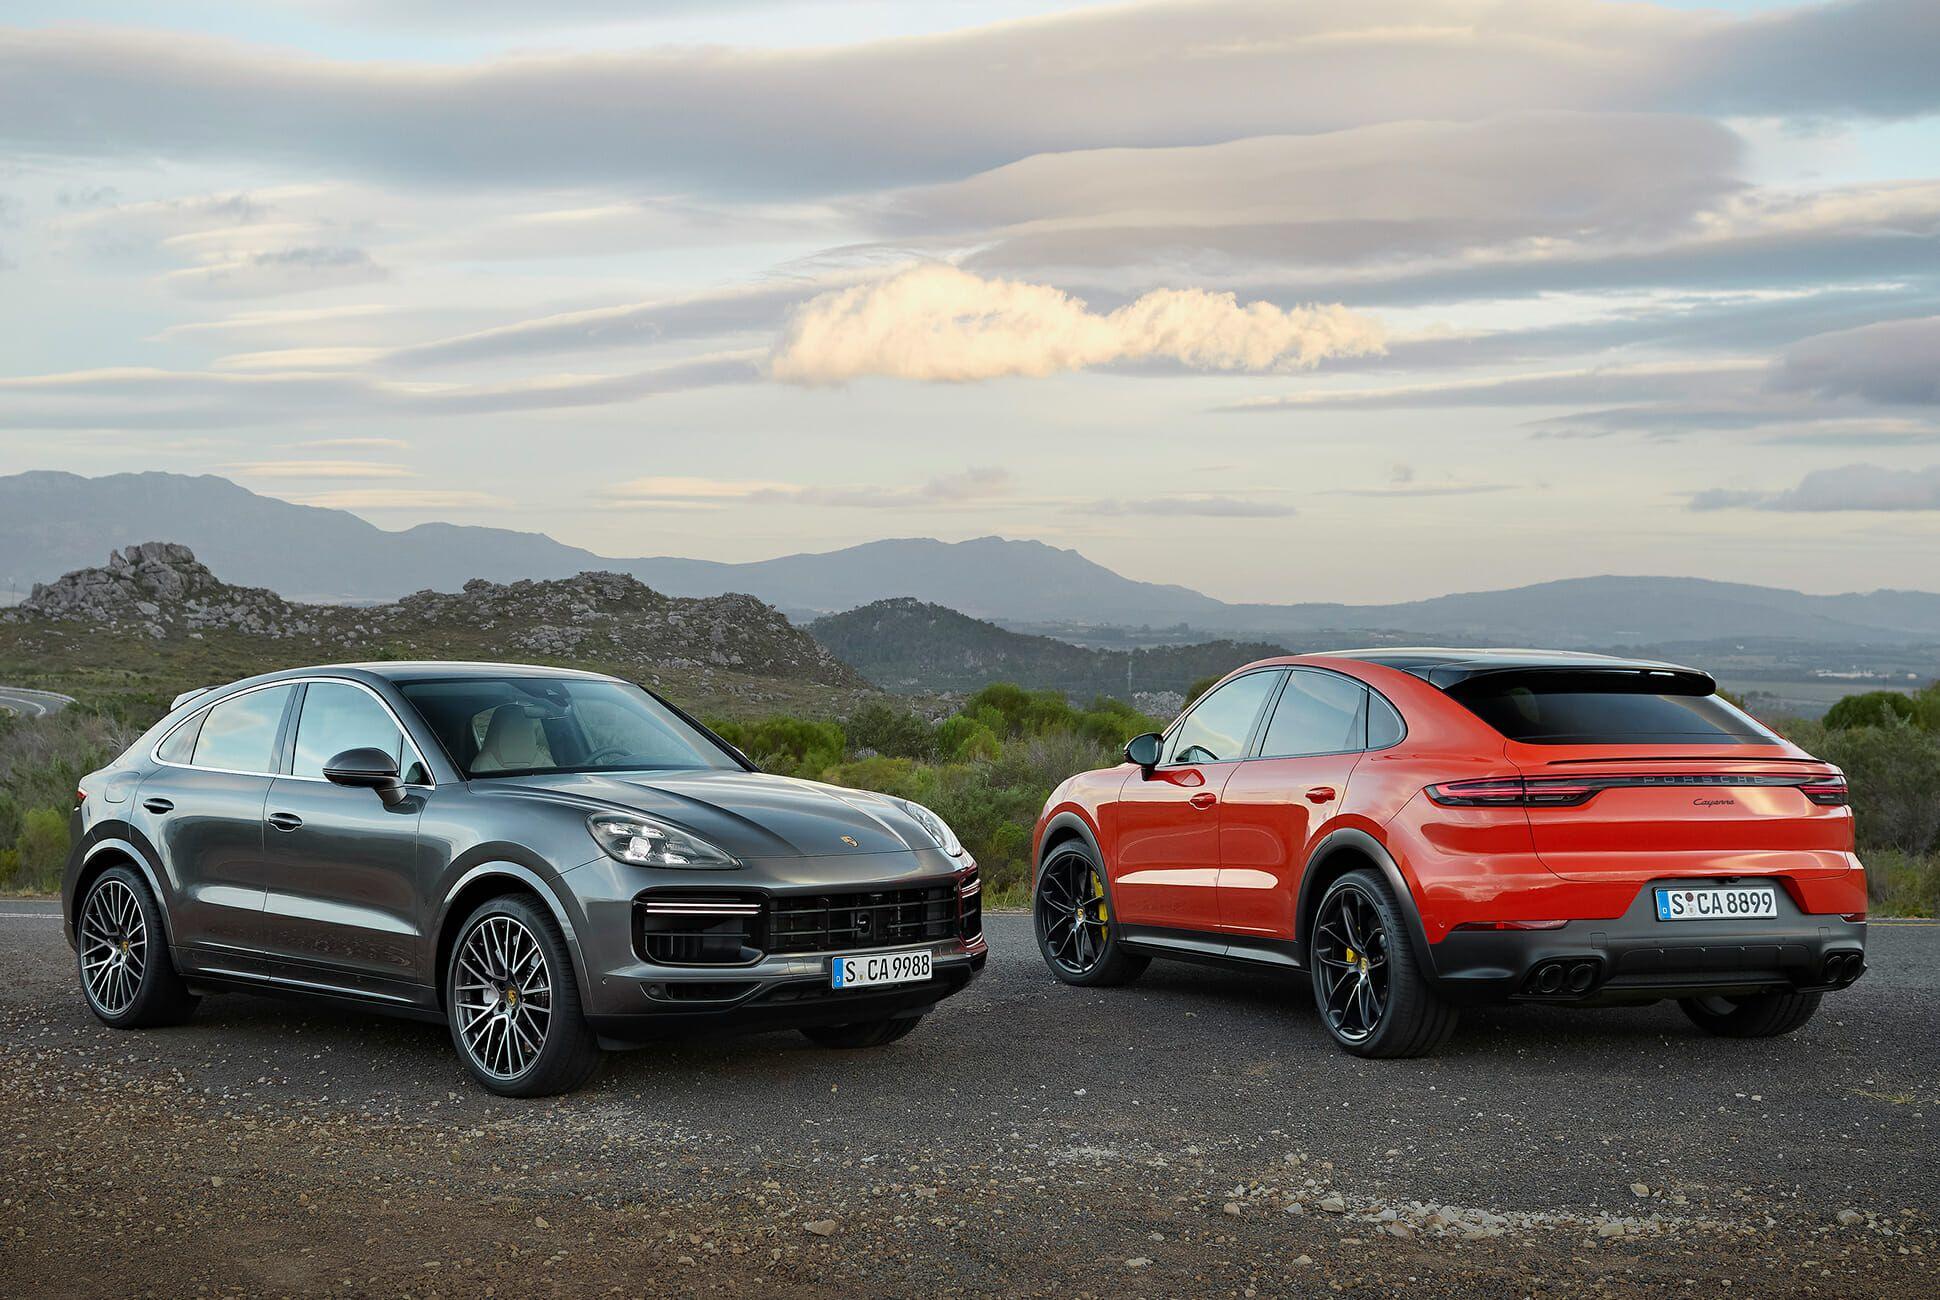 2020-Porsche-Cayenne-Coupe-gear-patrol-slide-1